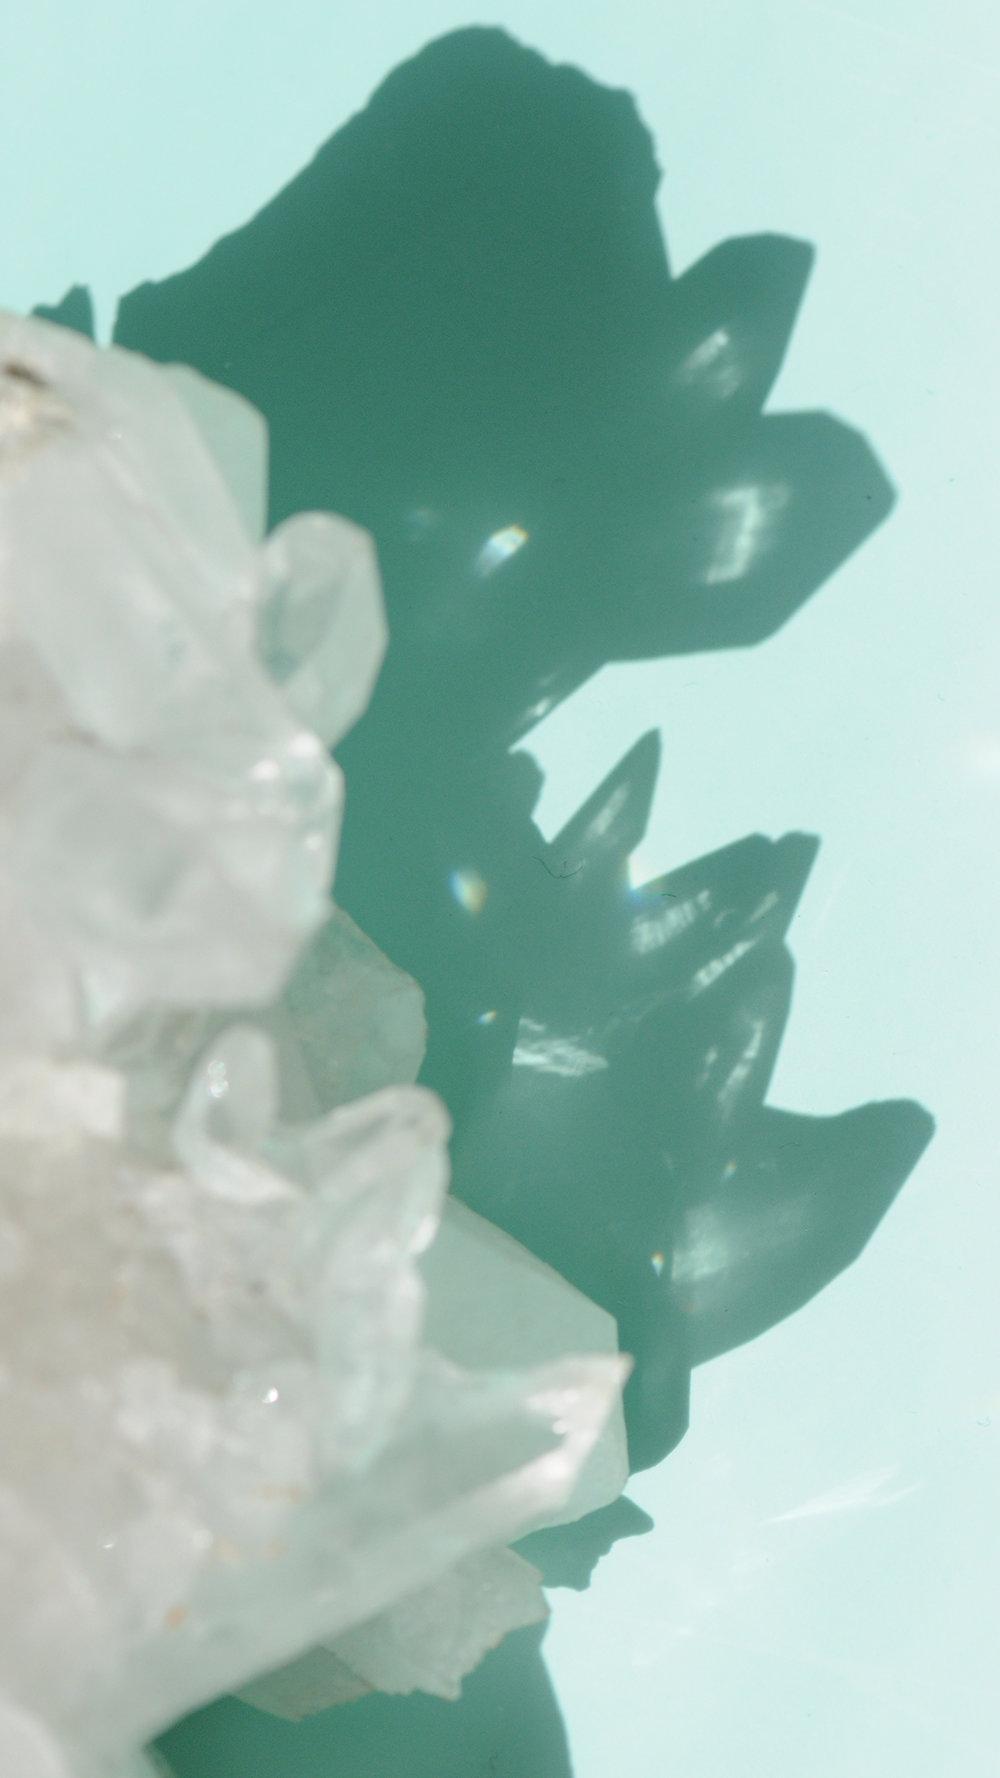 Turquoise Shadows